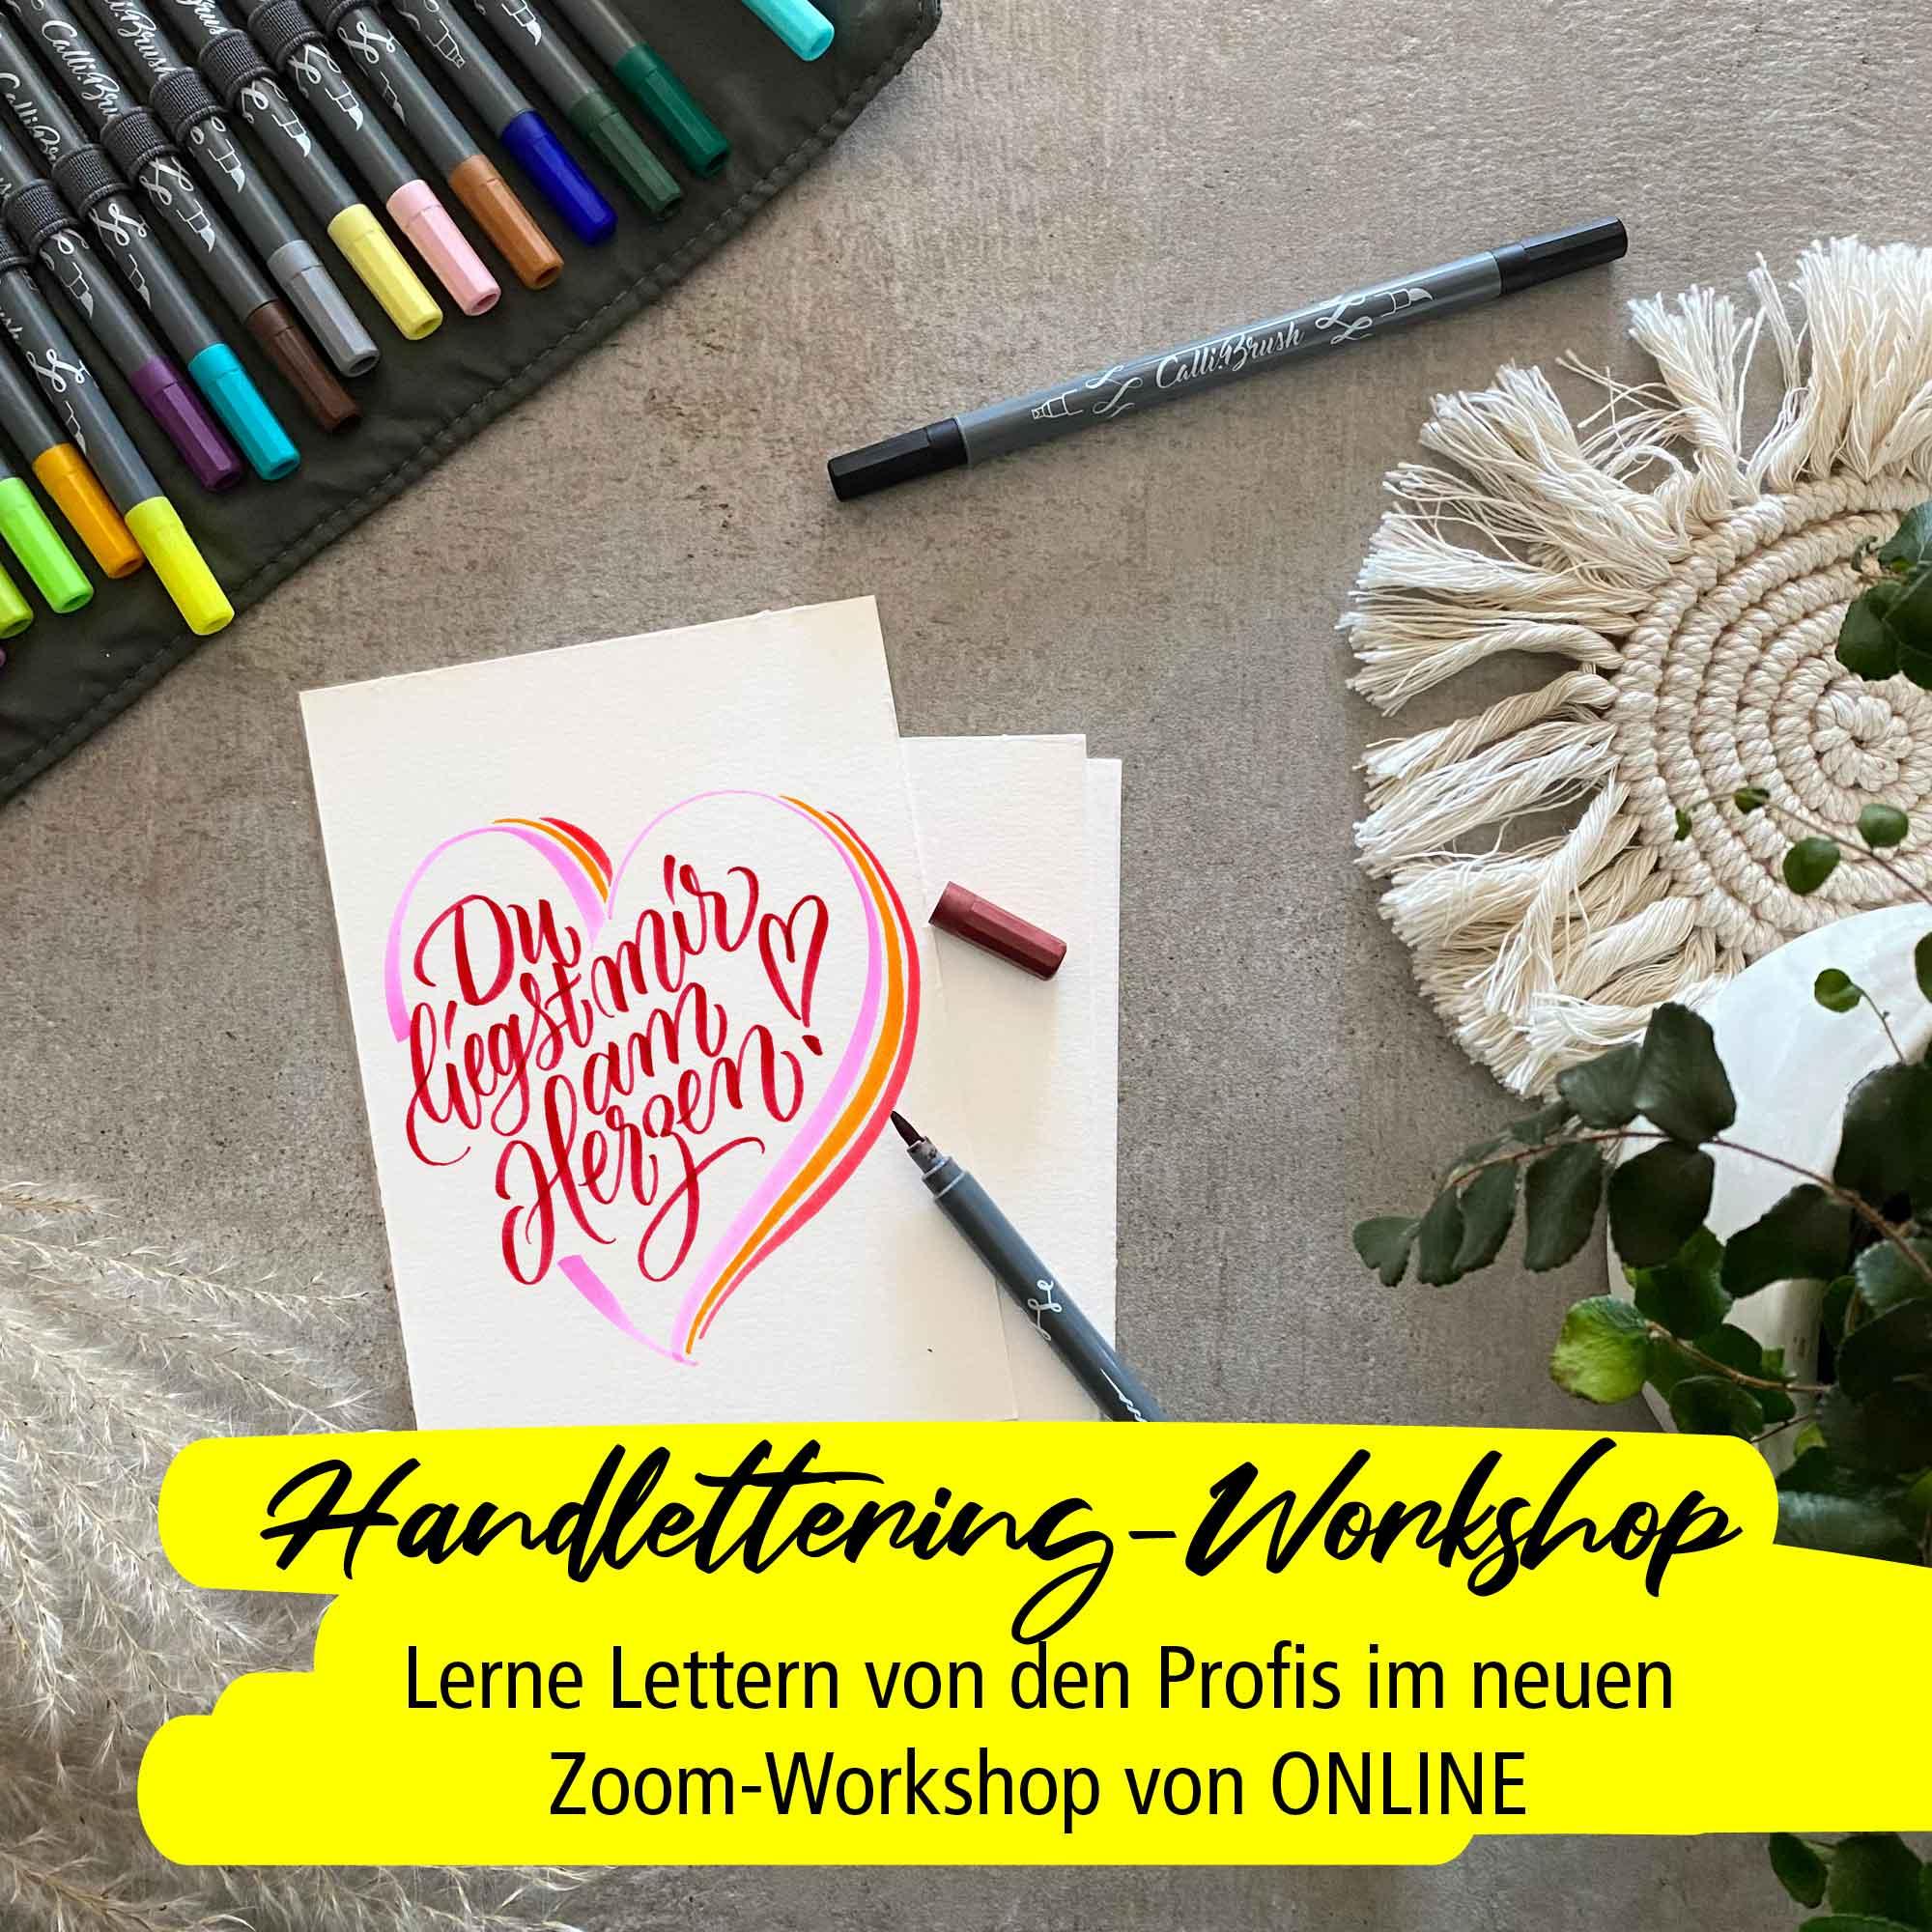 Handlettering-Workshop Einsteiger 17.03. inkl. Material-Paket